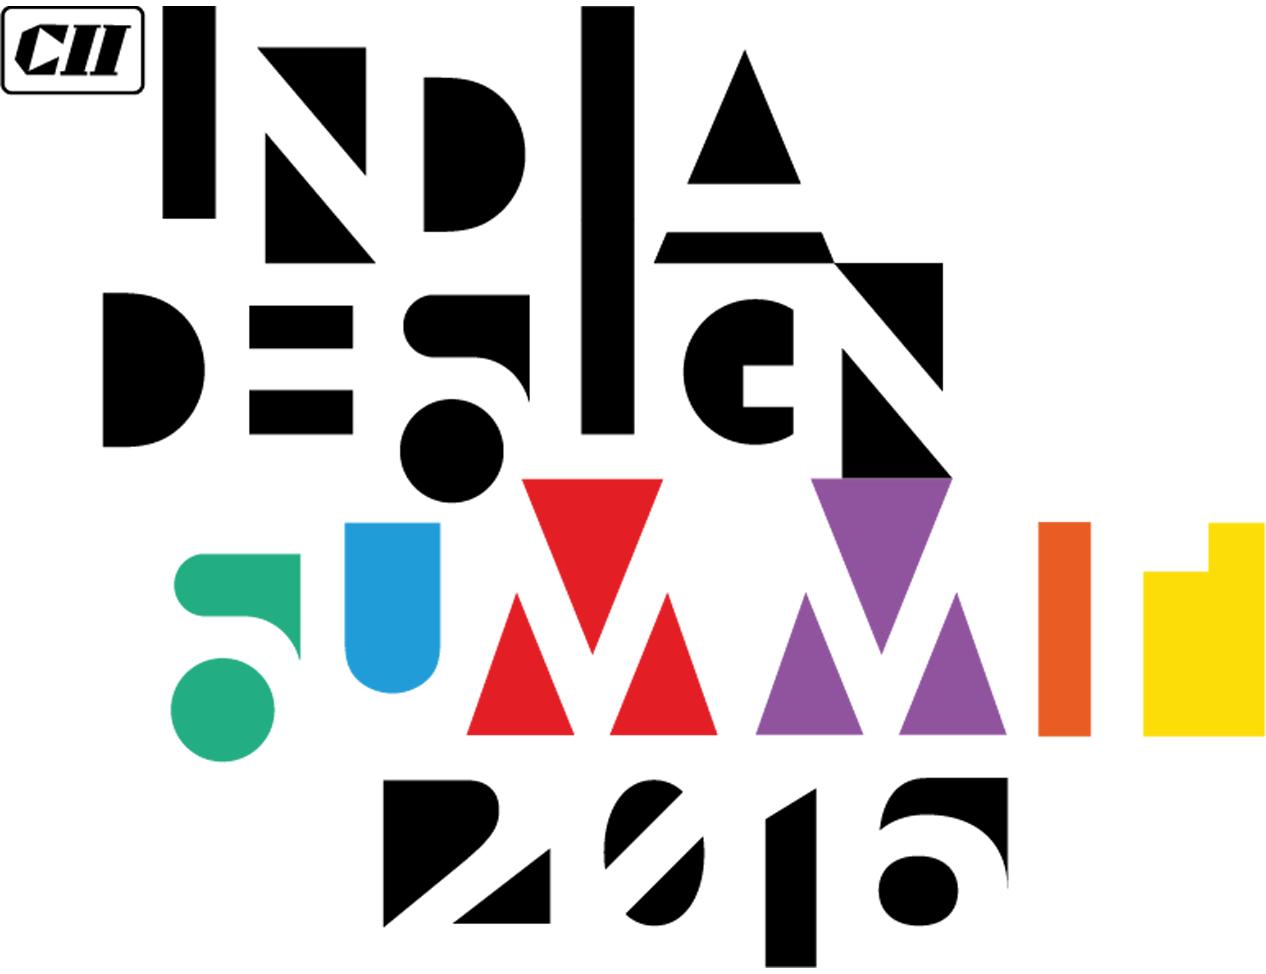 Cii awards 2018 design excellence awards 2018 for Design lago